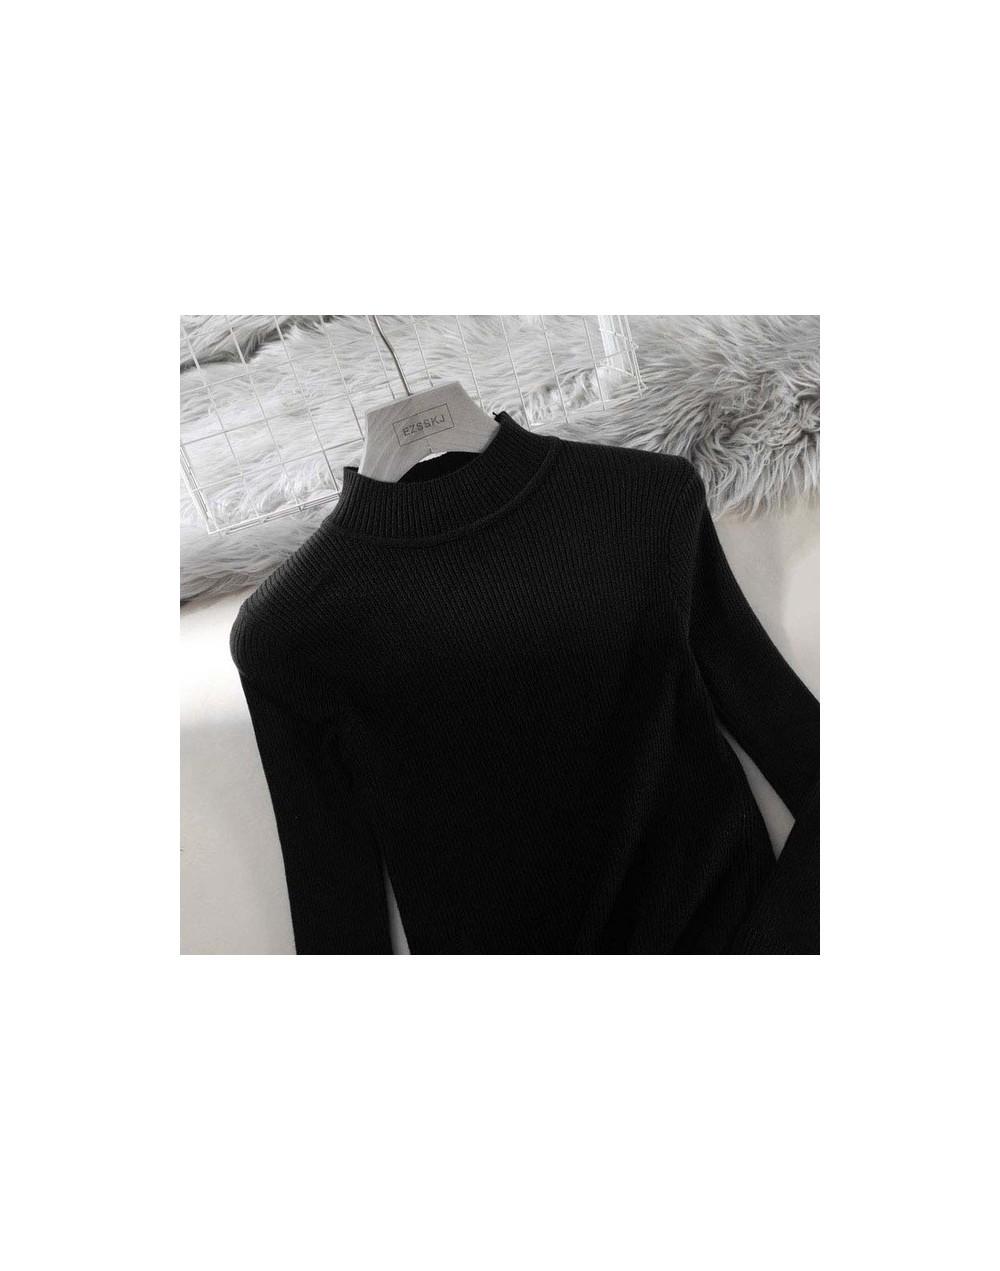 2019 Knitted Women high neck Sweater Pullovers Turtleneck Autumn Winter Basic Women Sweaters Slim Fit Black - Black - 4C4114...